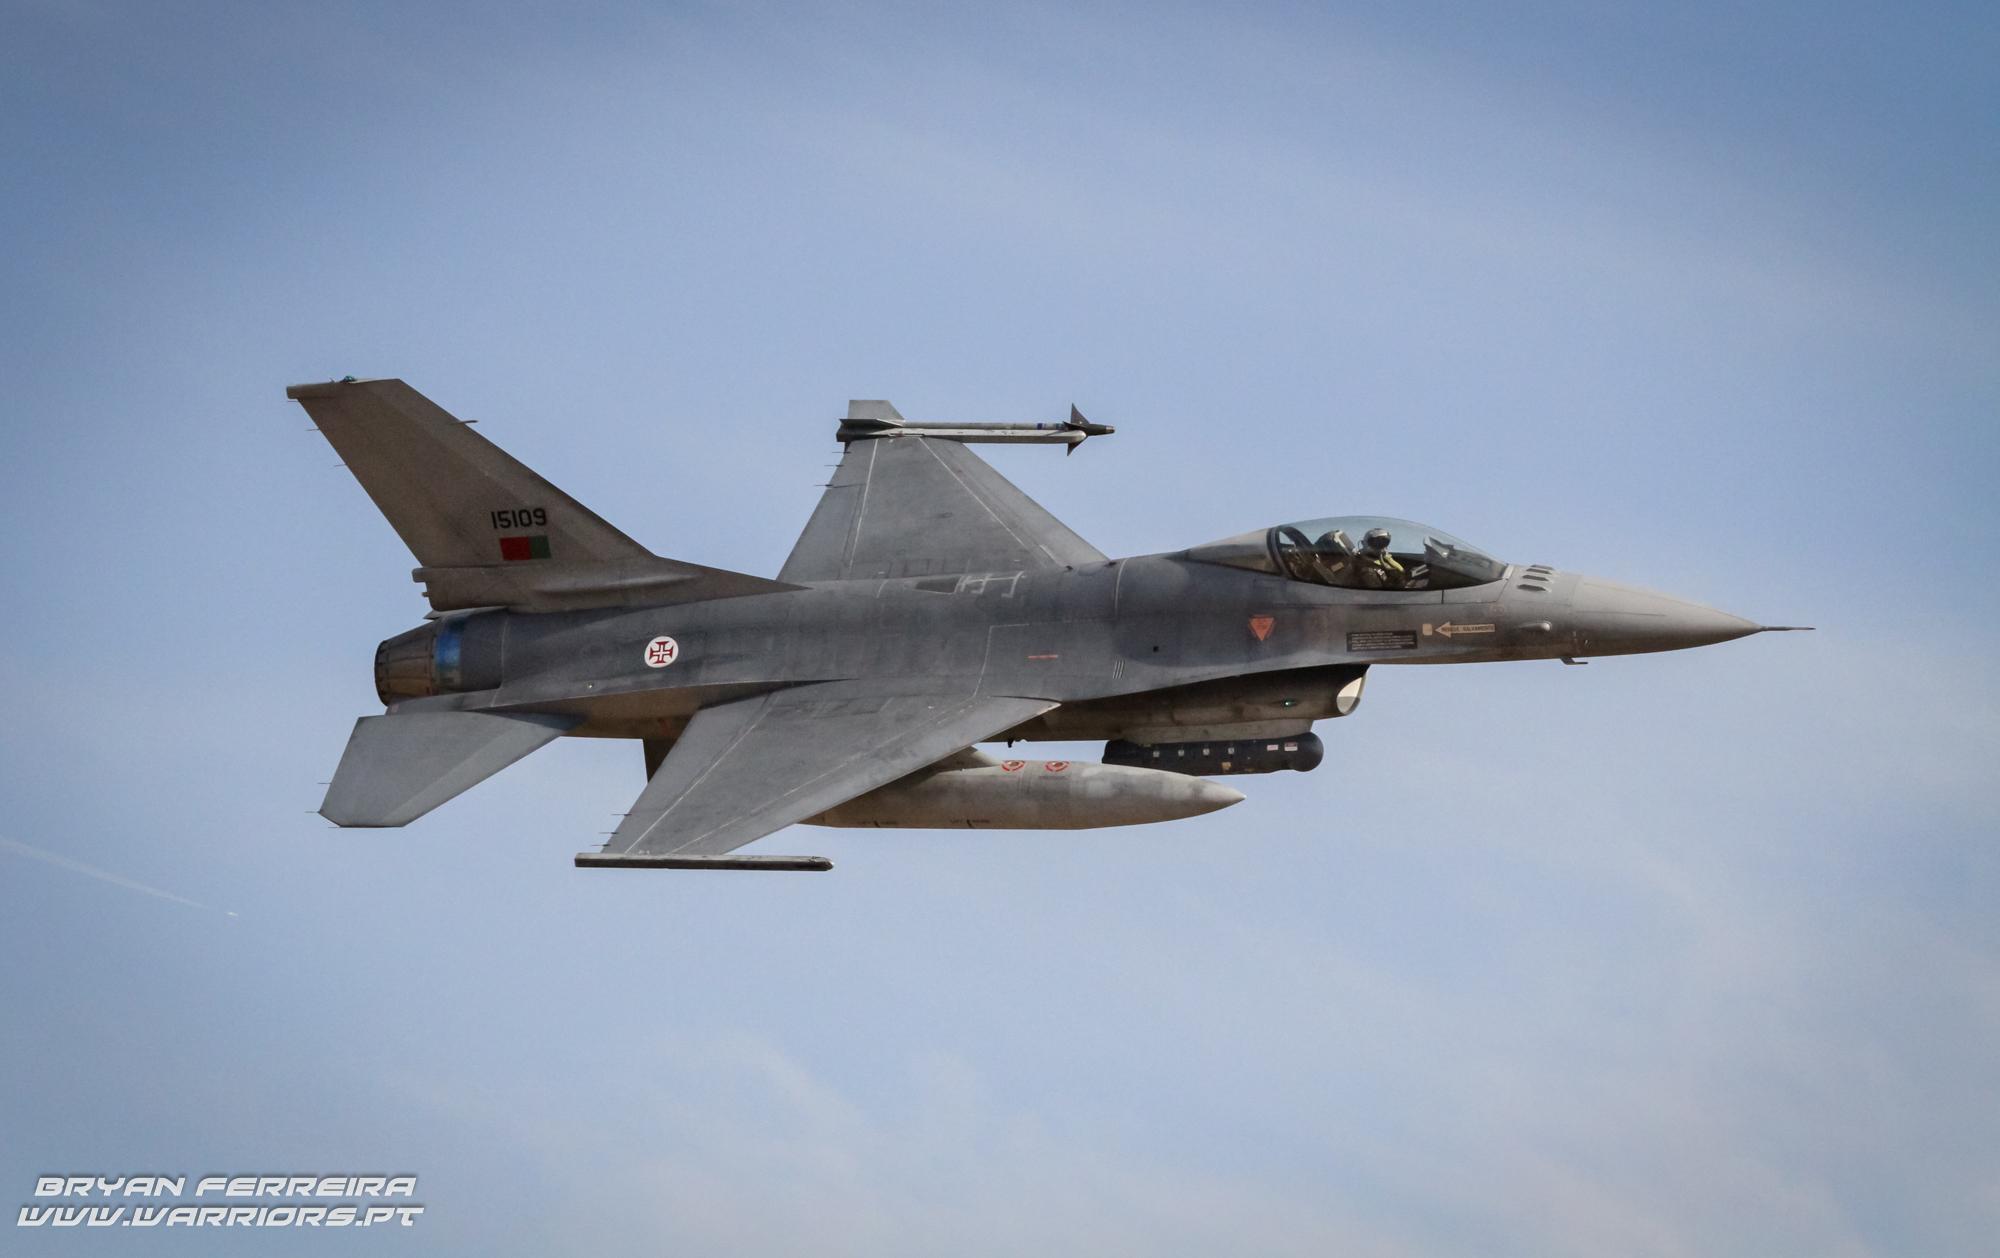 Portuguese Air force F16